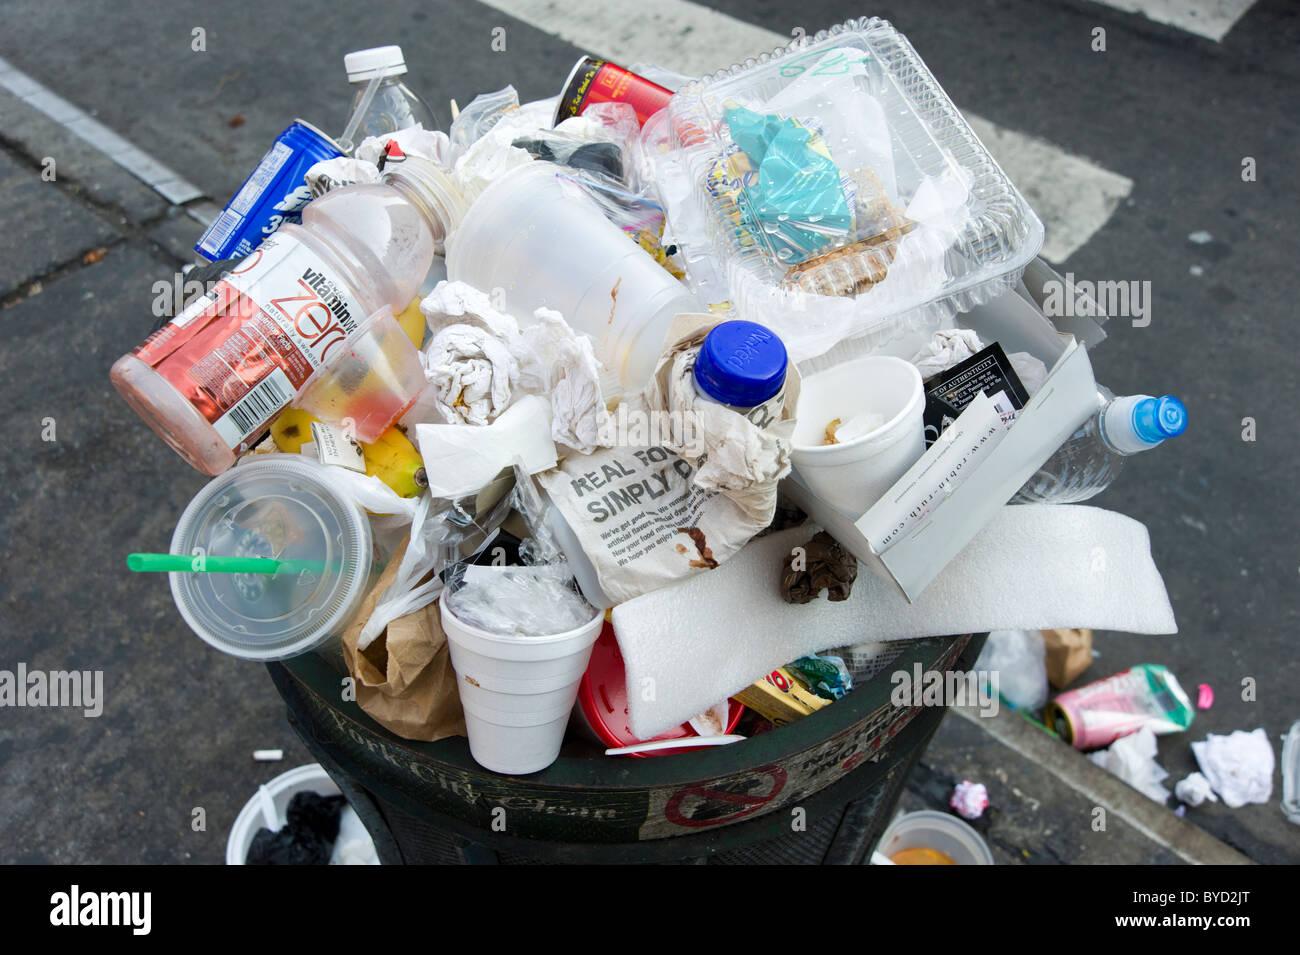 Overflowing rubbish bin, New York City, USA - Stock Image